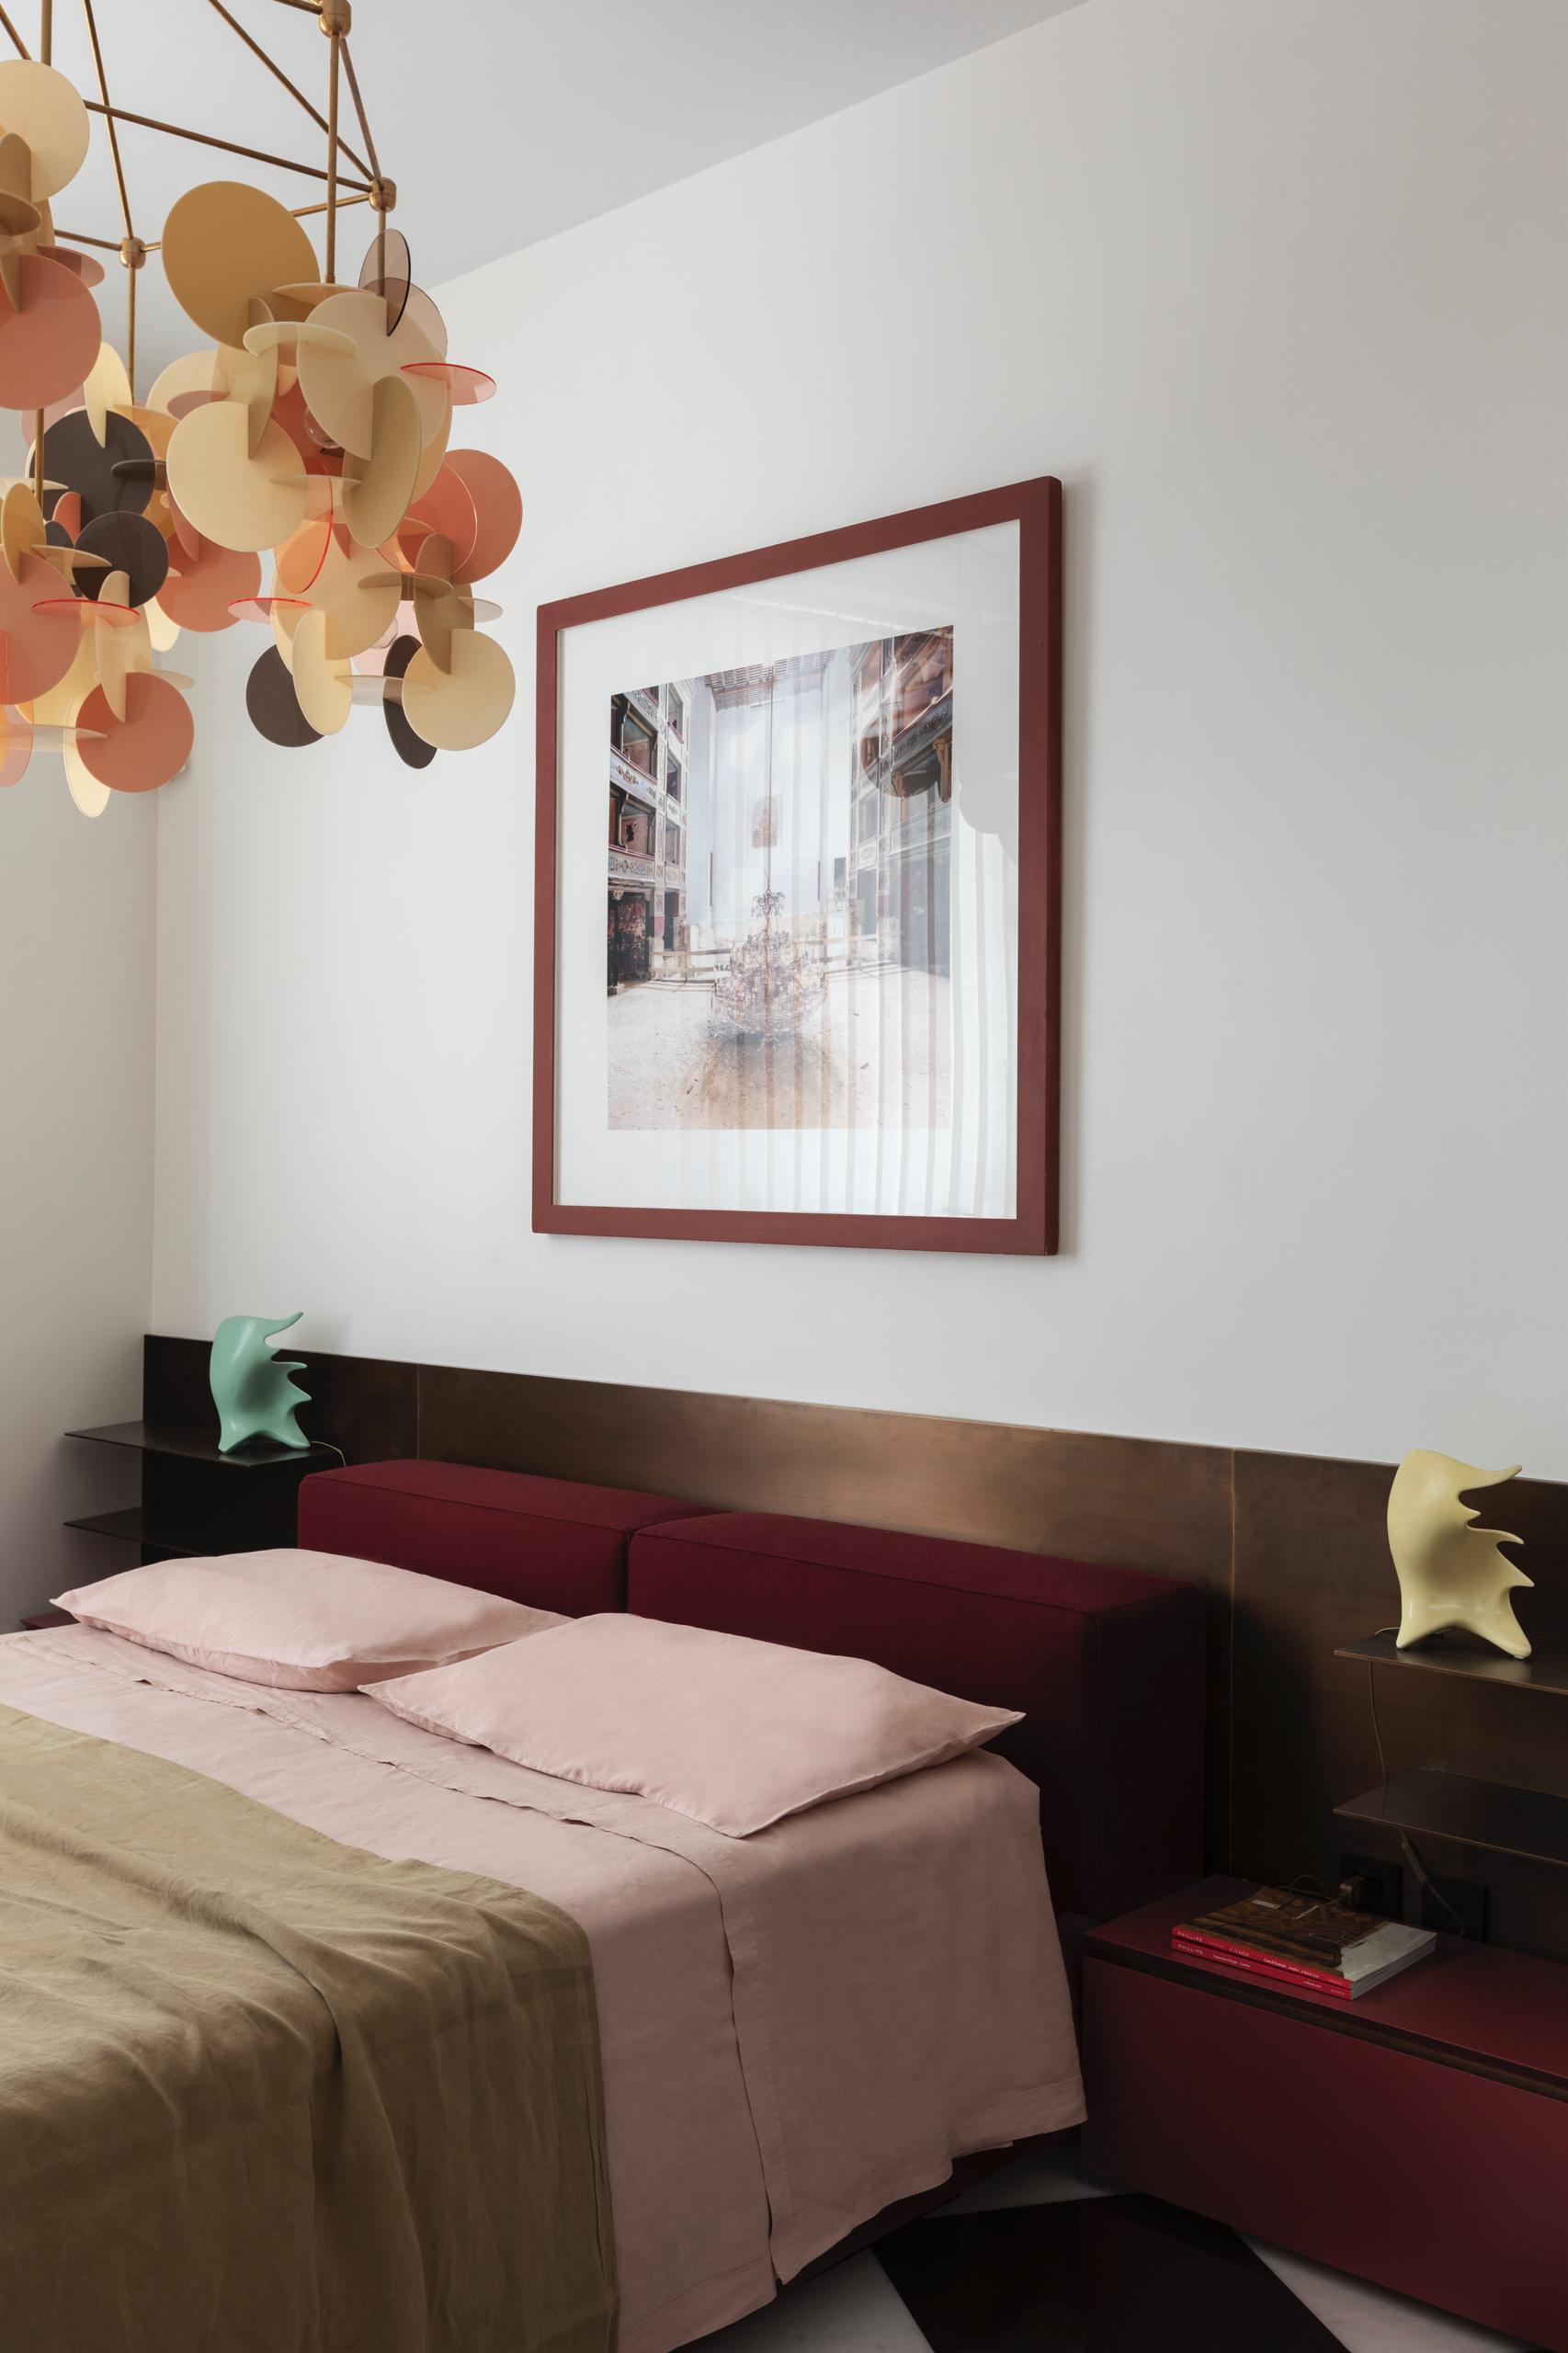 design-ideen-nilufar-gallery-mailand-homestory-decohome.de-schlafzimmer